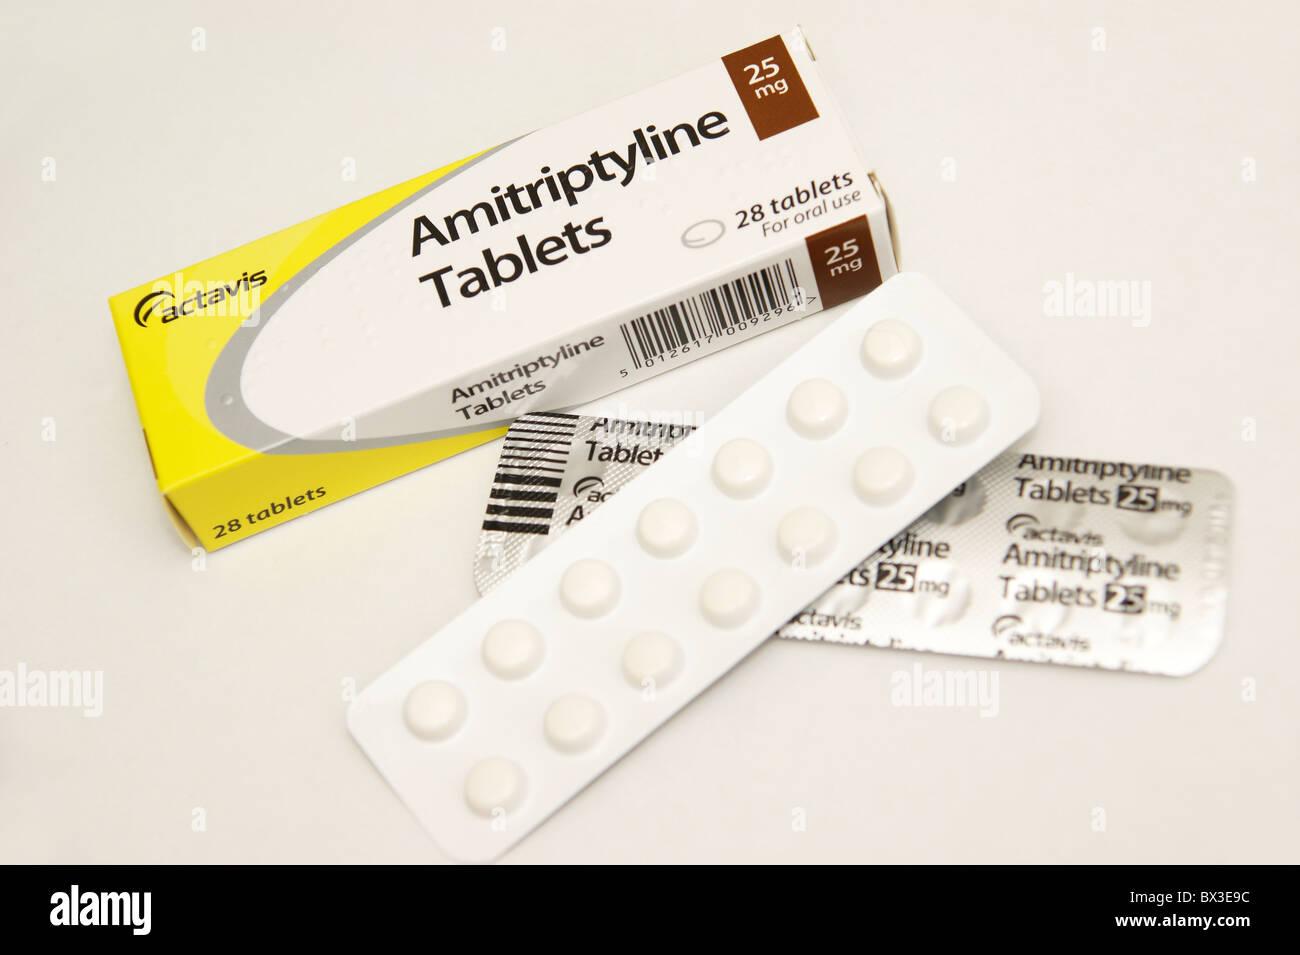 amitriptyline tablets for depression & depressive disorders - Stock Image